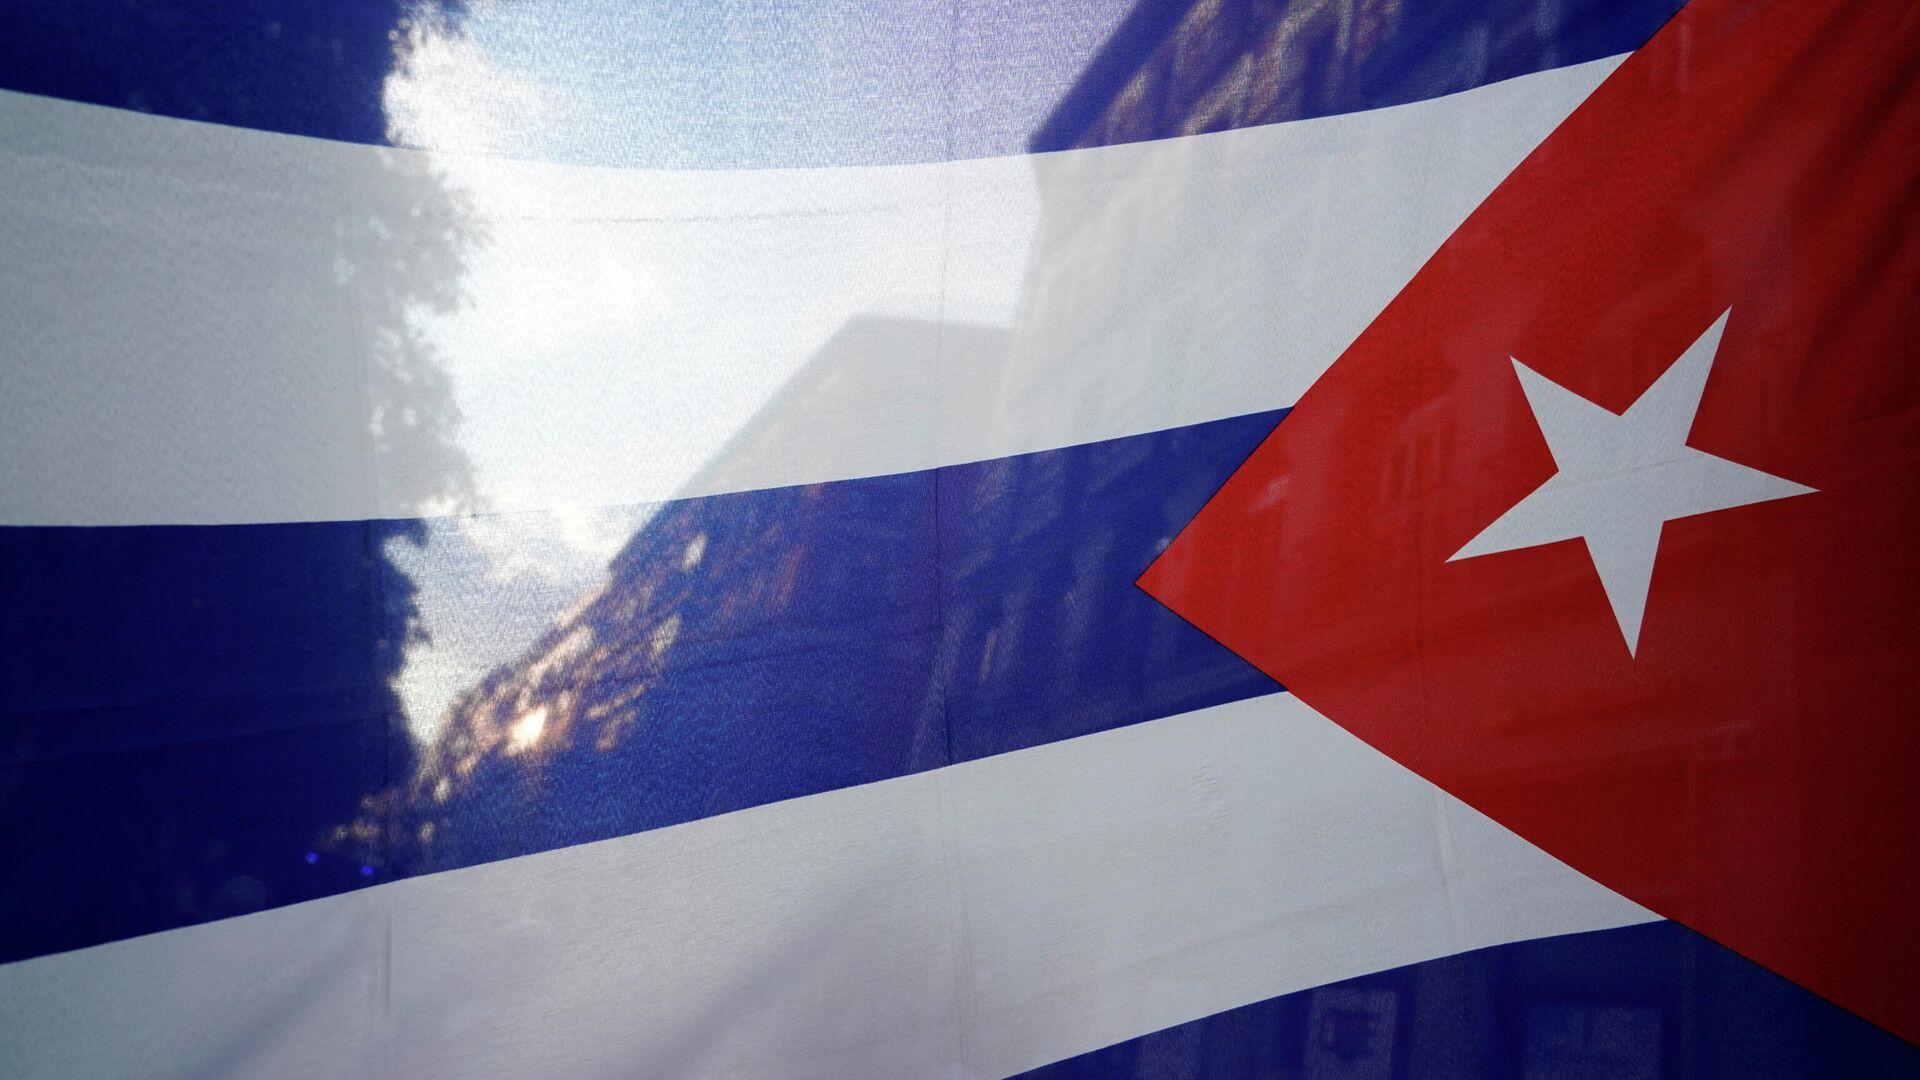 La bandera de Cuba - Sputnik Mundo, 1920, 19.08.2021